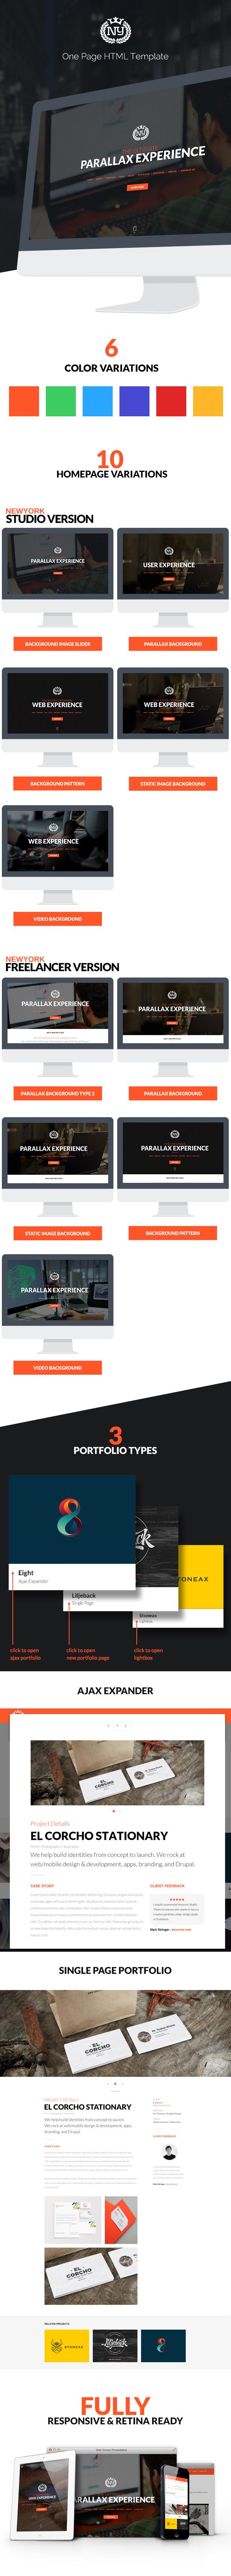 Newyork Studio - Multipurpose Parallax Template